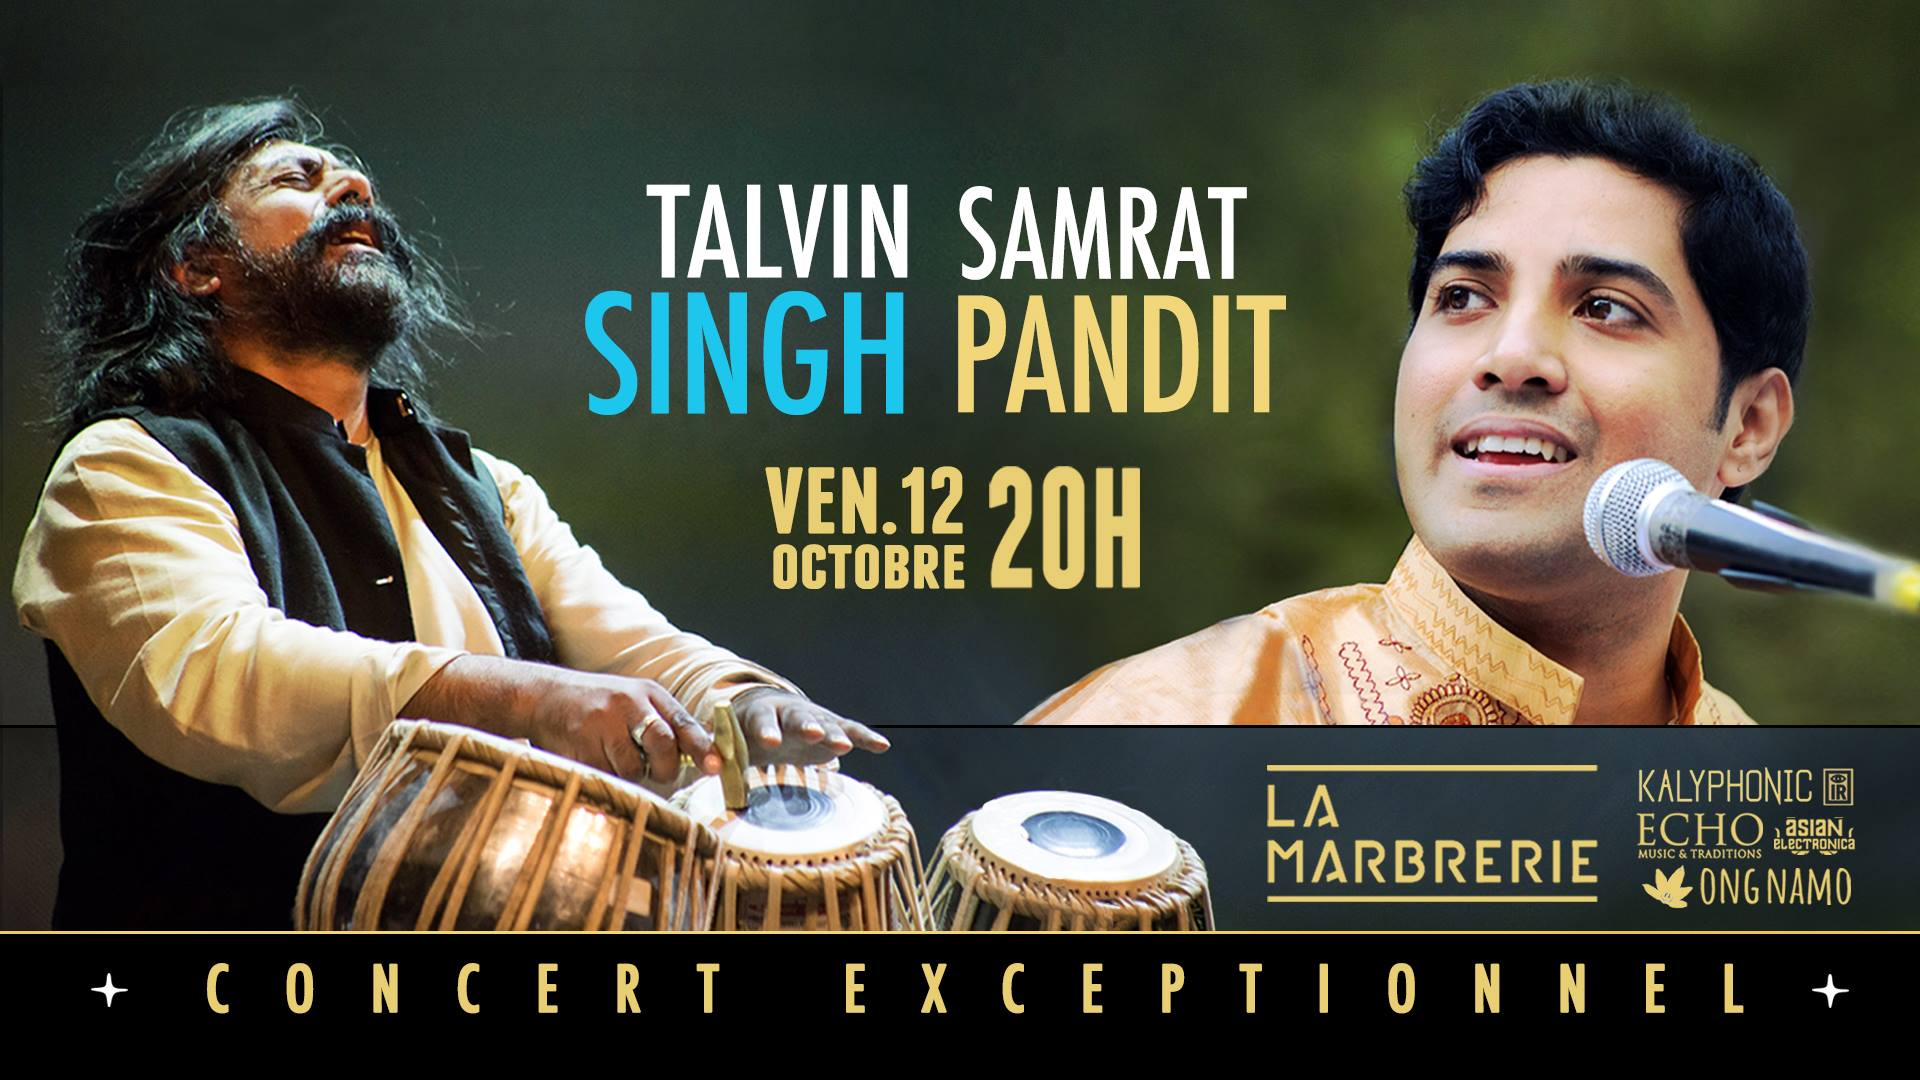 Un concert de chant Hindoustani accompagné de percussion tabla le 12 octobre